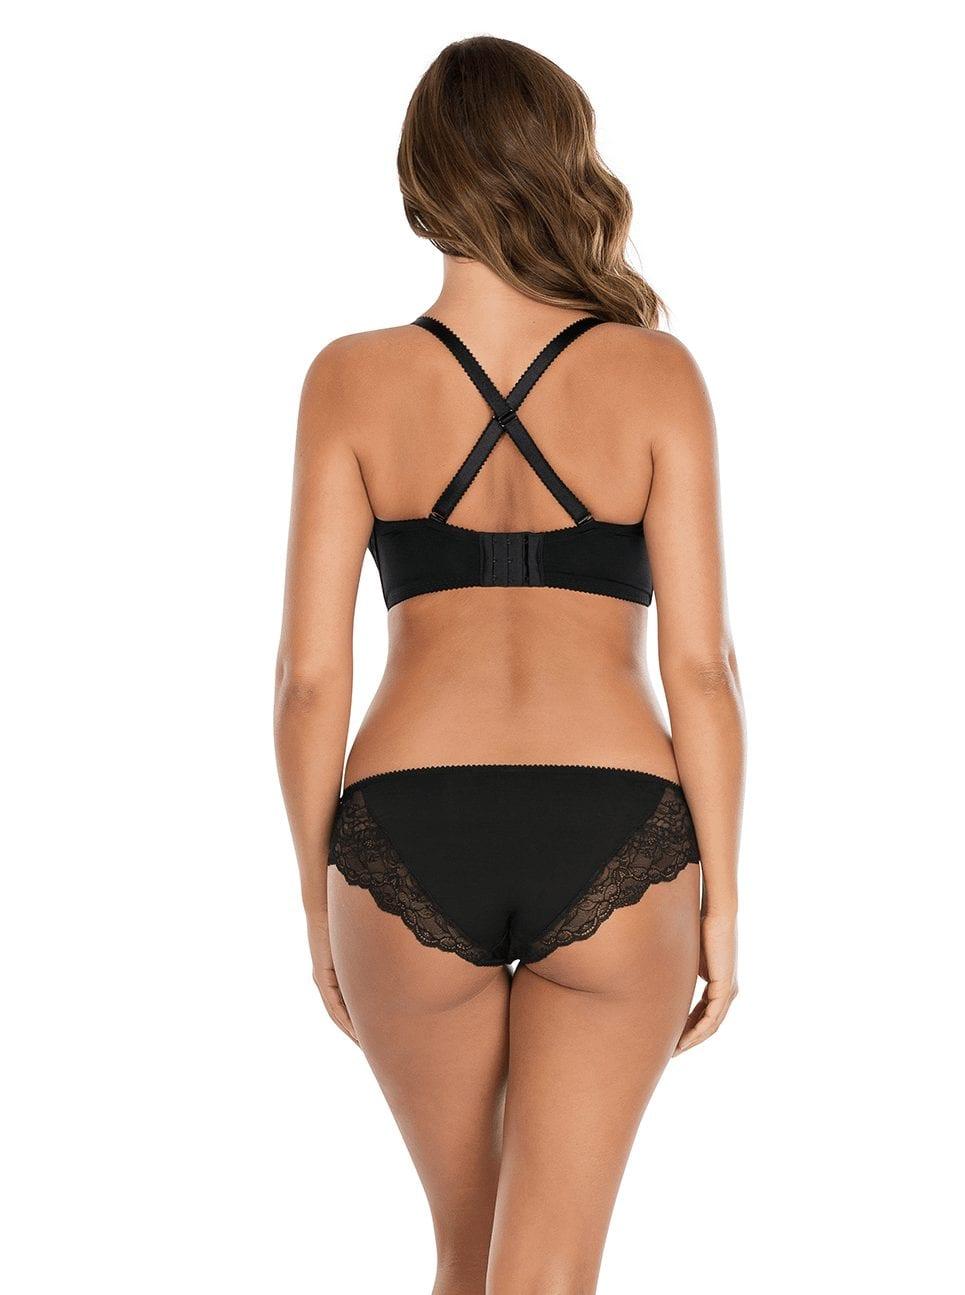 Бюстгальтеры Elissa_ContourUnderwireBraP5011_BikiniP5013_Black_Cross-Back